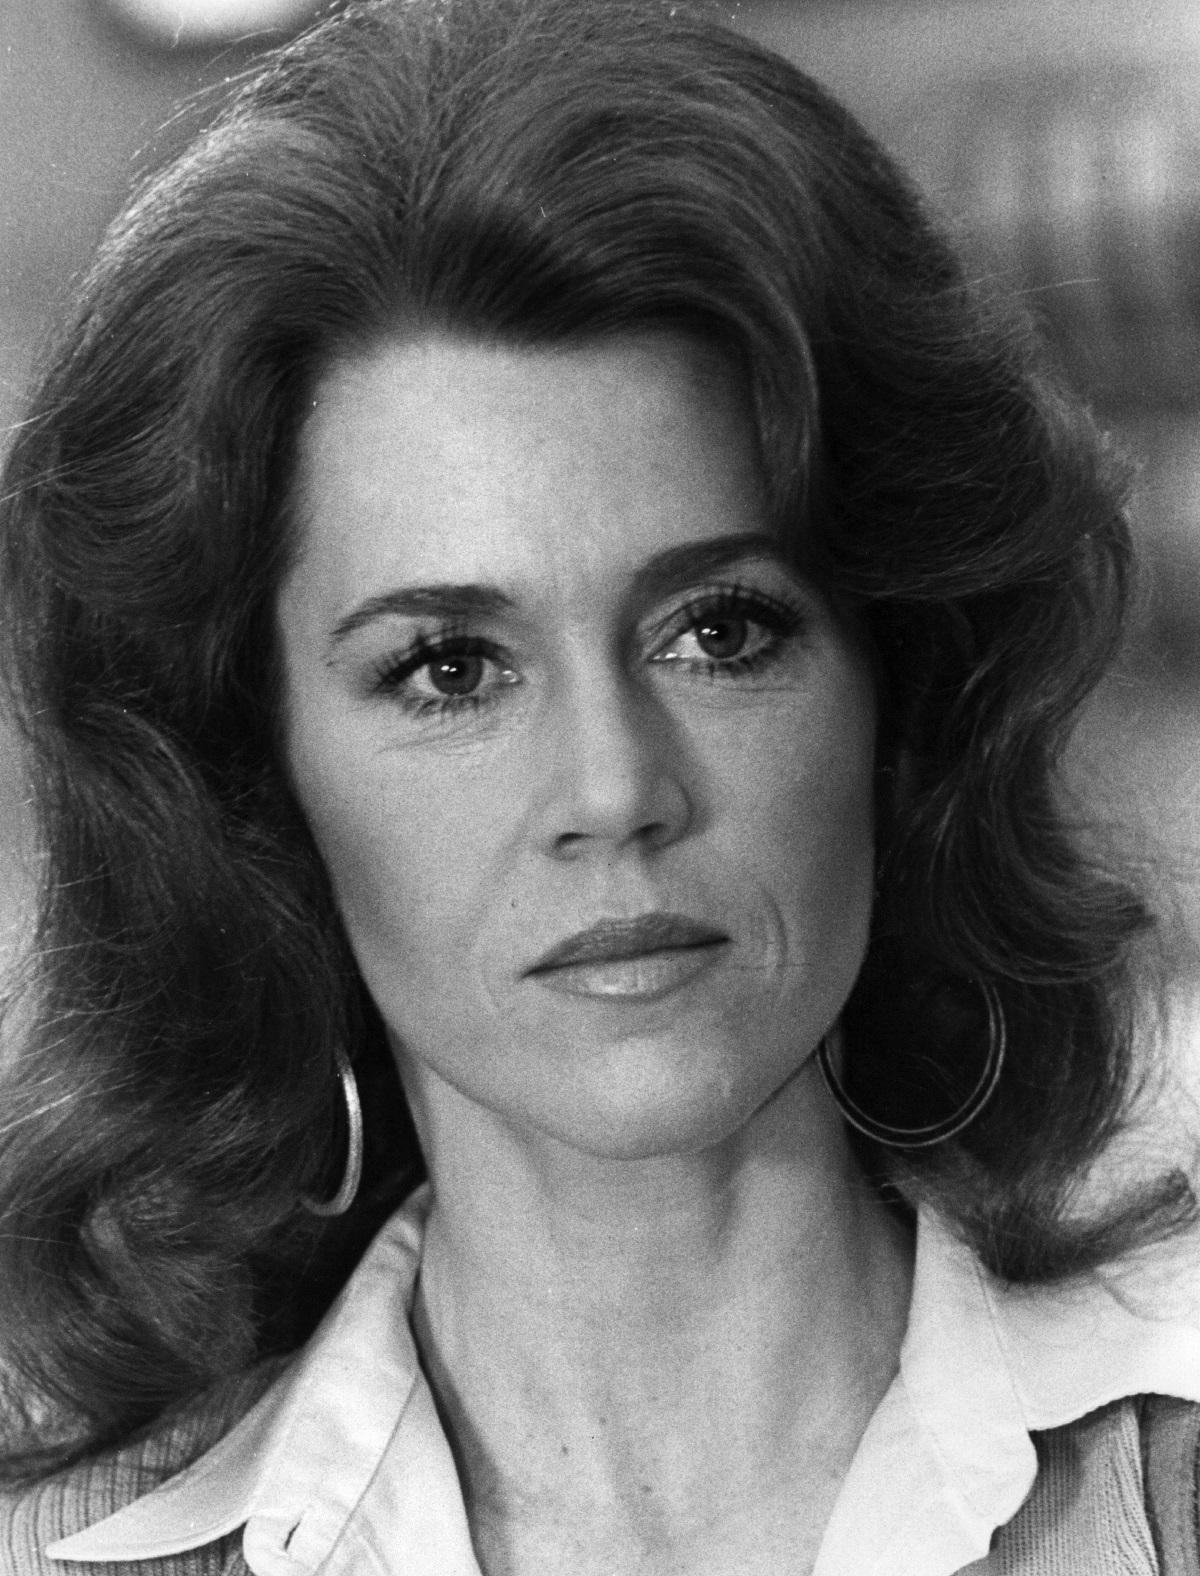 Джейн Фонда (1979 г.)